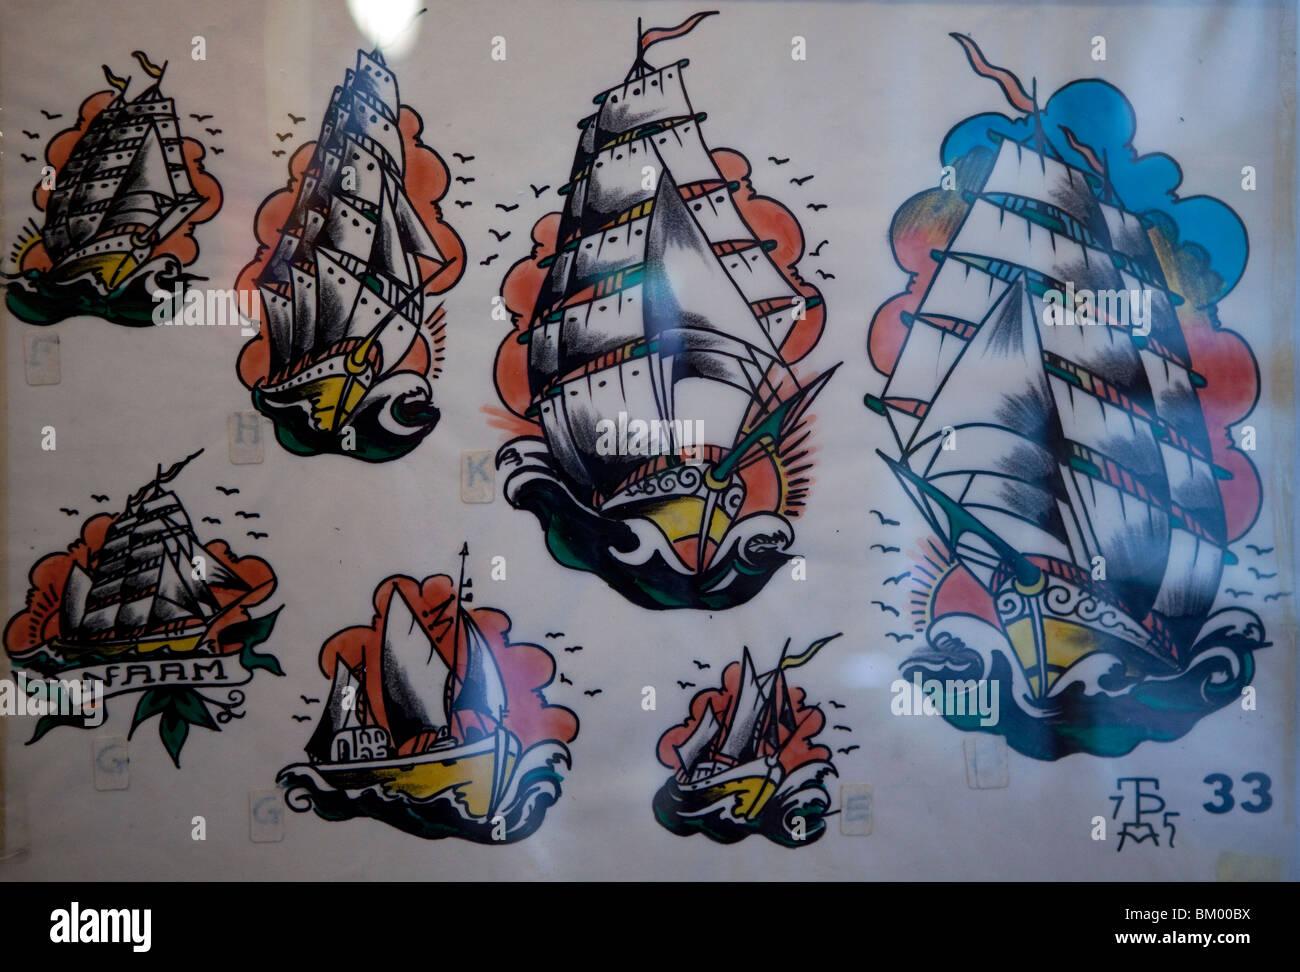 Tattoo Peters Tattoo Parlour, Amsterdam, Netherlands - Stock Image